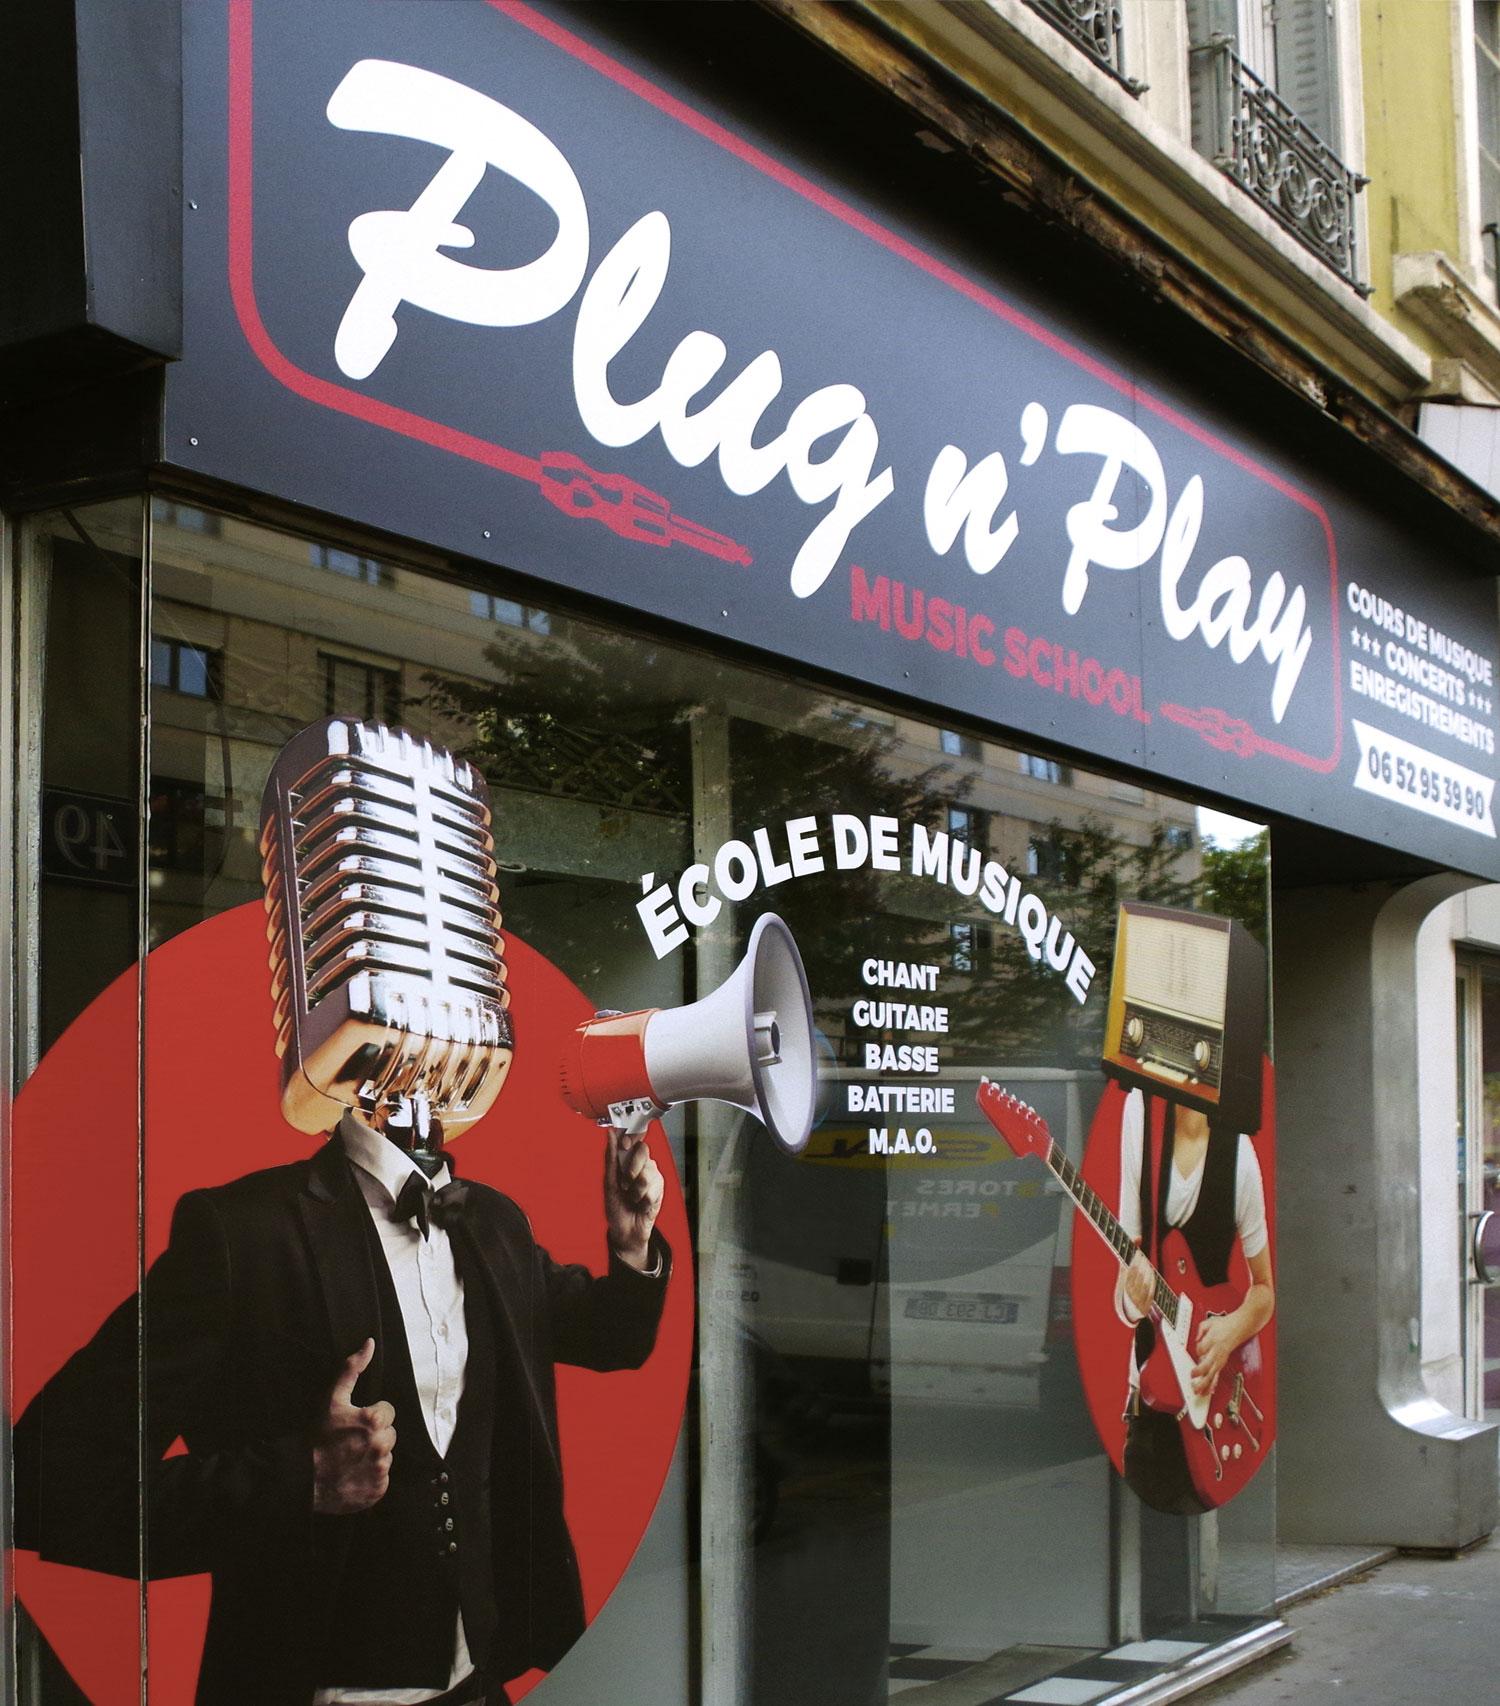 Ecole de Musique Lyon - Plug n'Play Music School